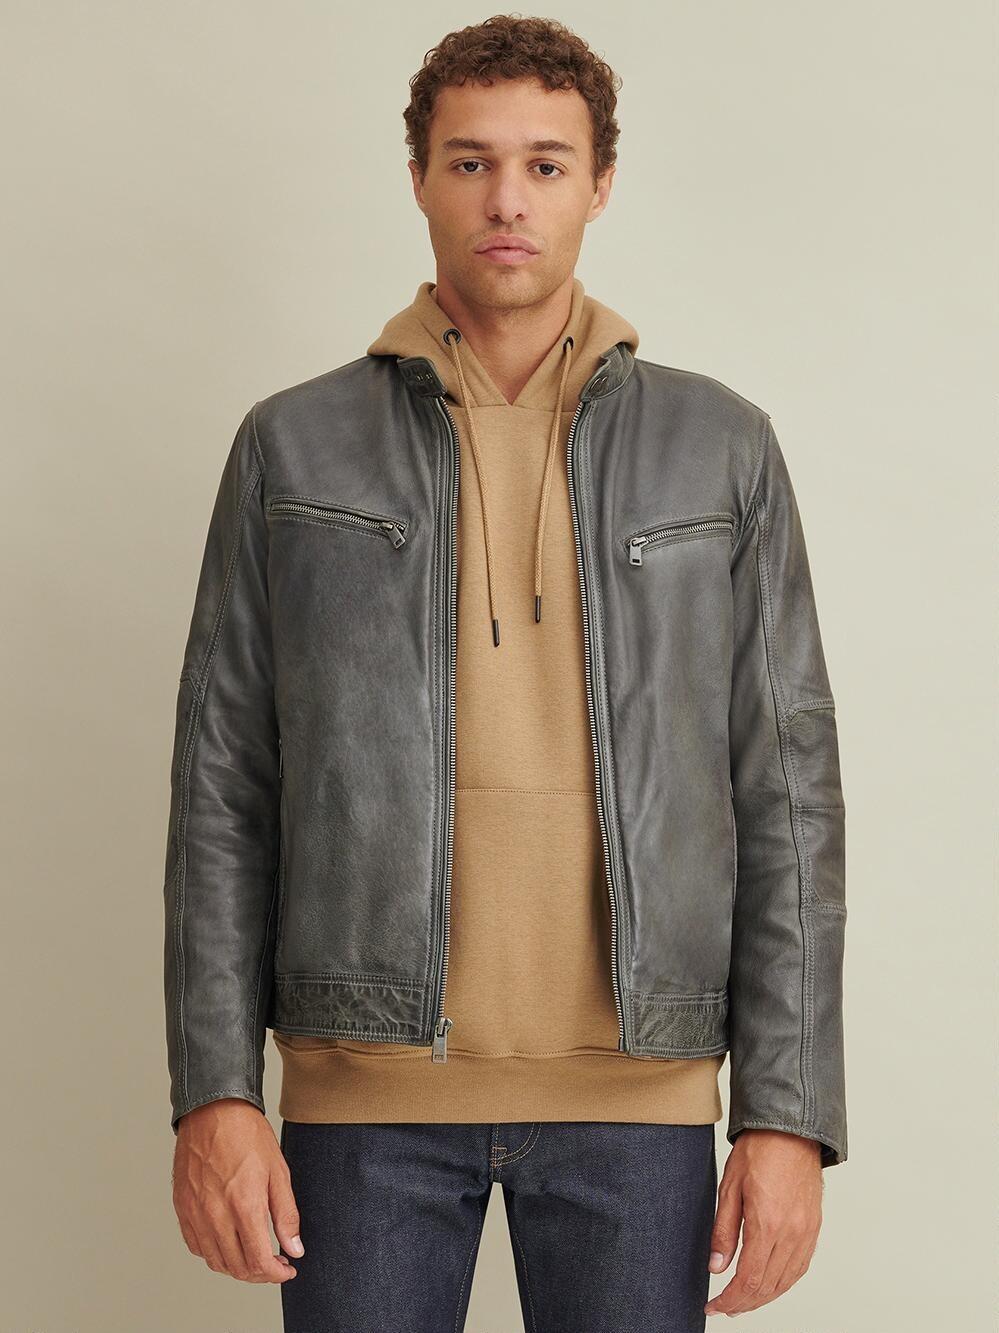 wilsons-leather-brent-moto-jacket